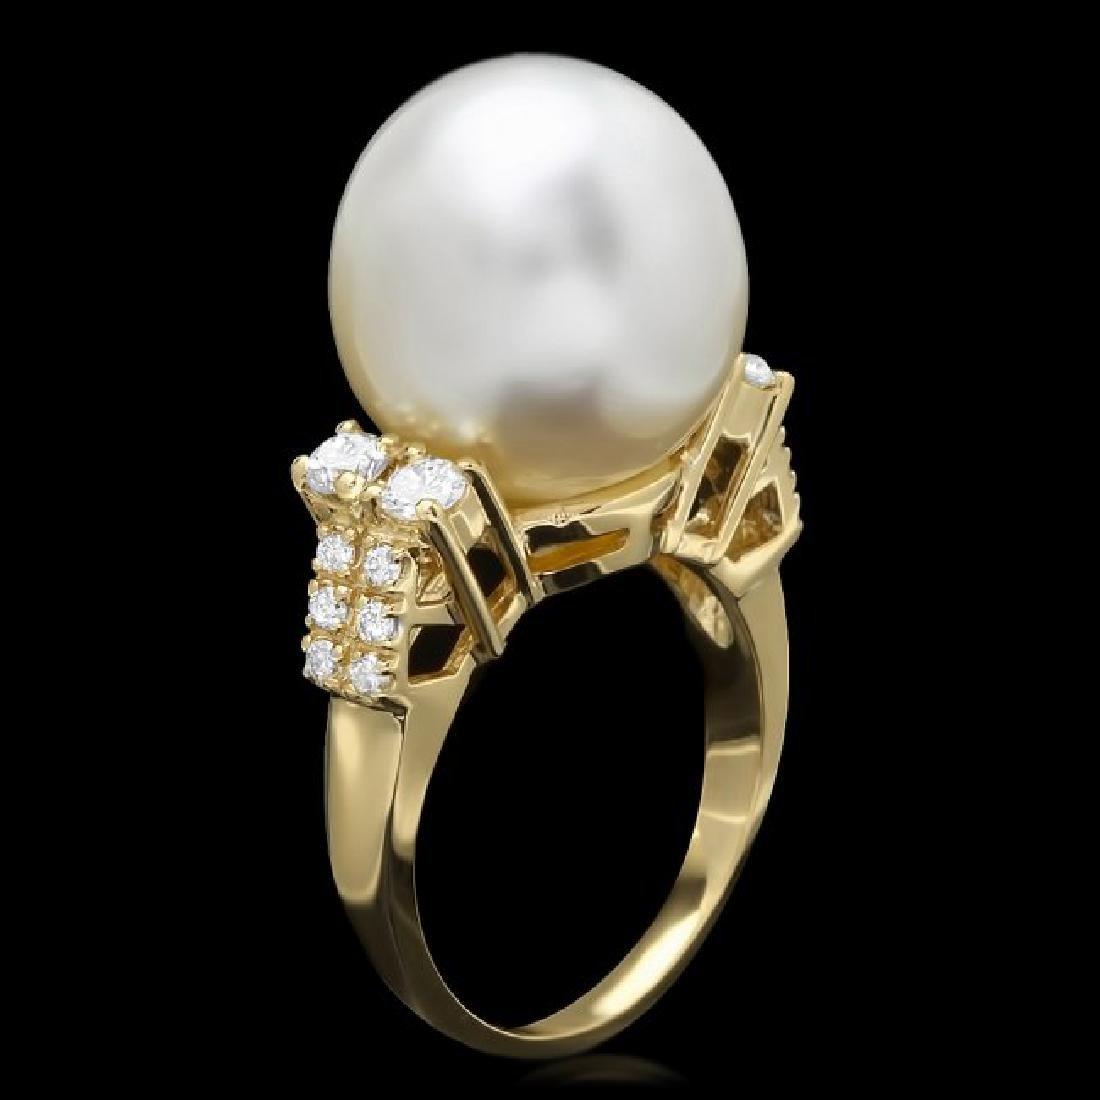 14k Gold 14 X 16mm Pearl 0.60ct Diamond Ring - 2